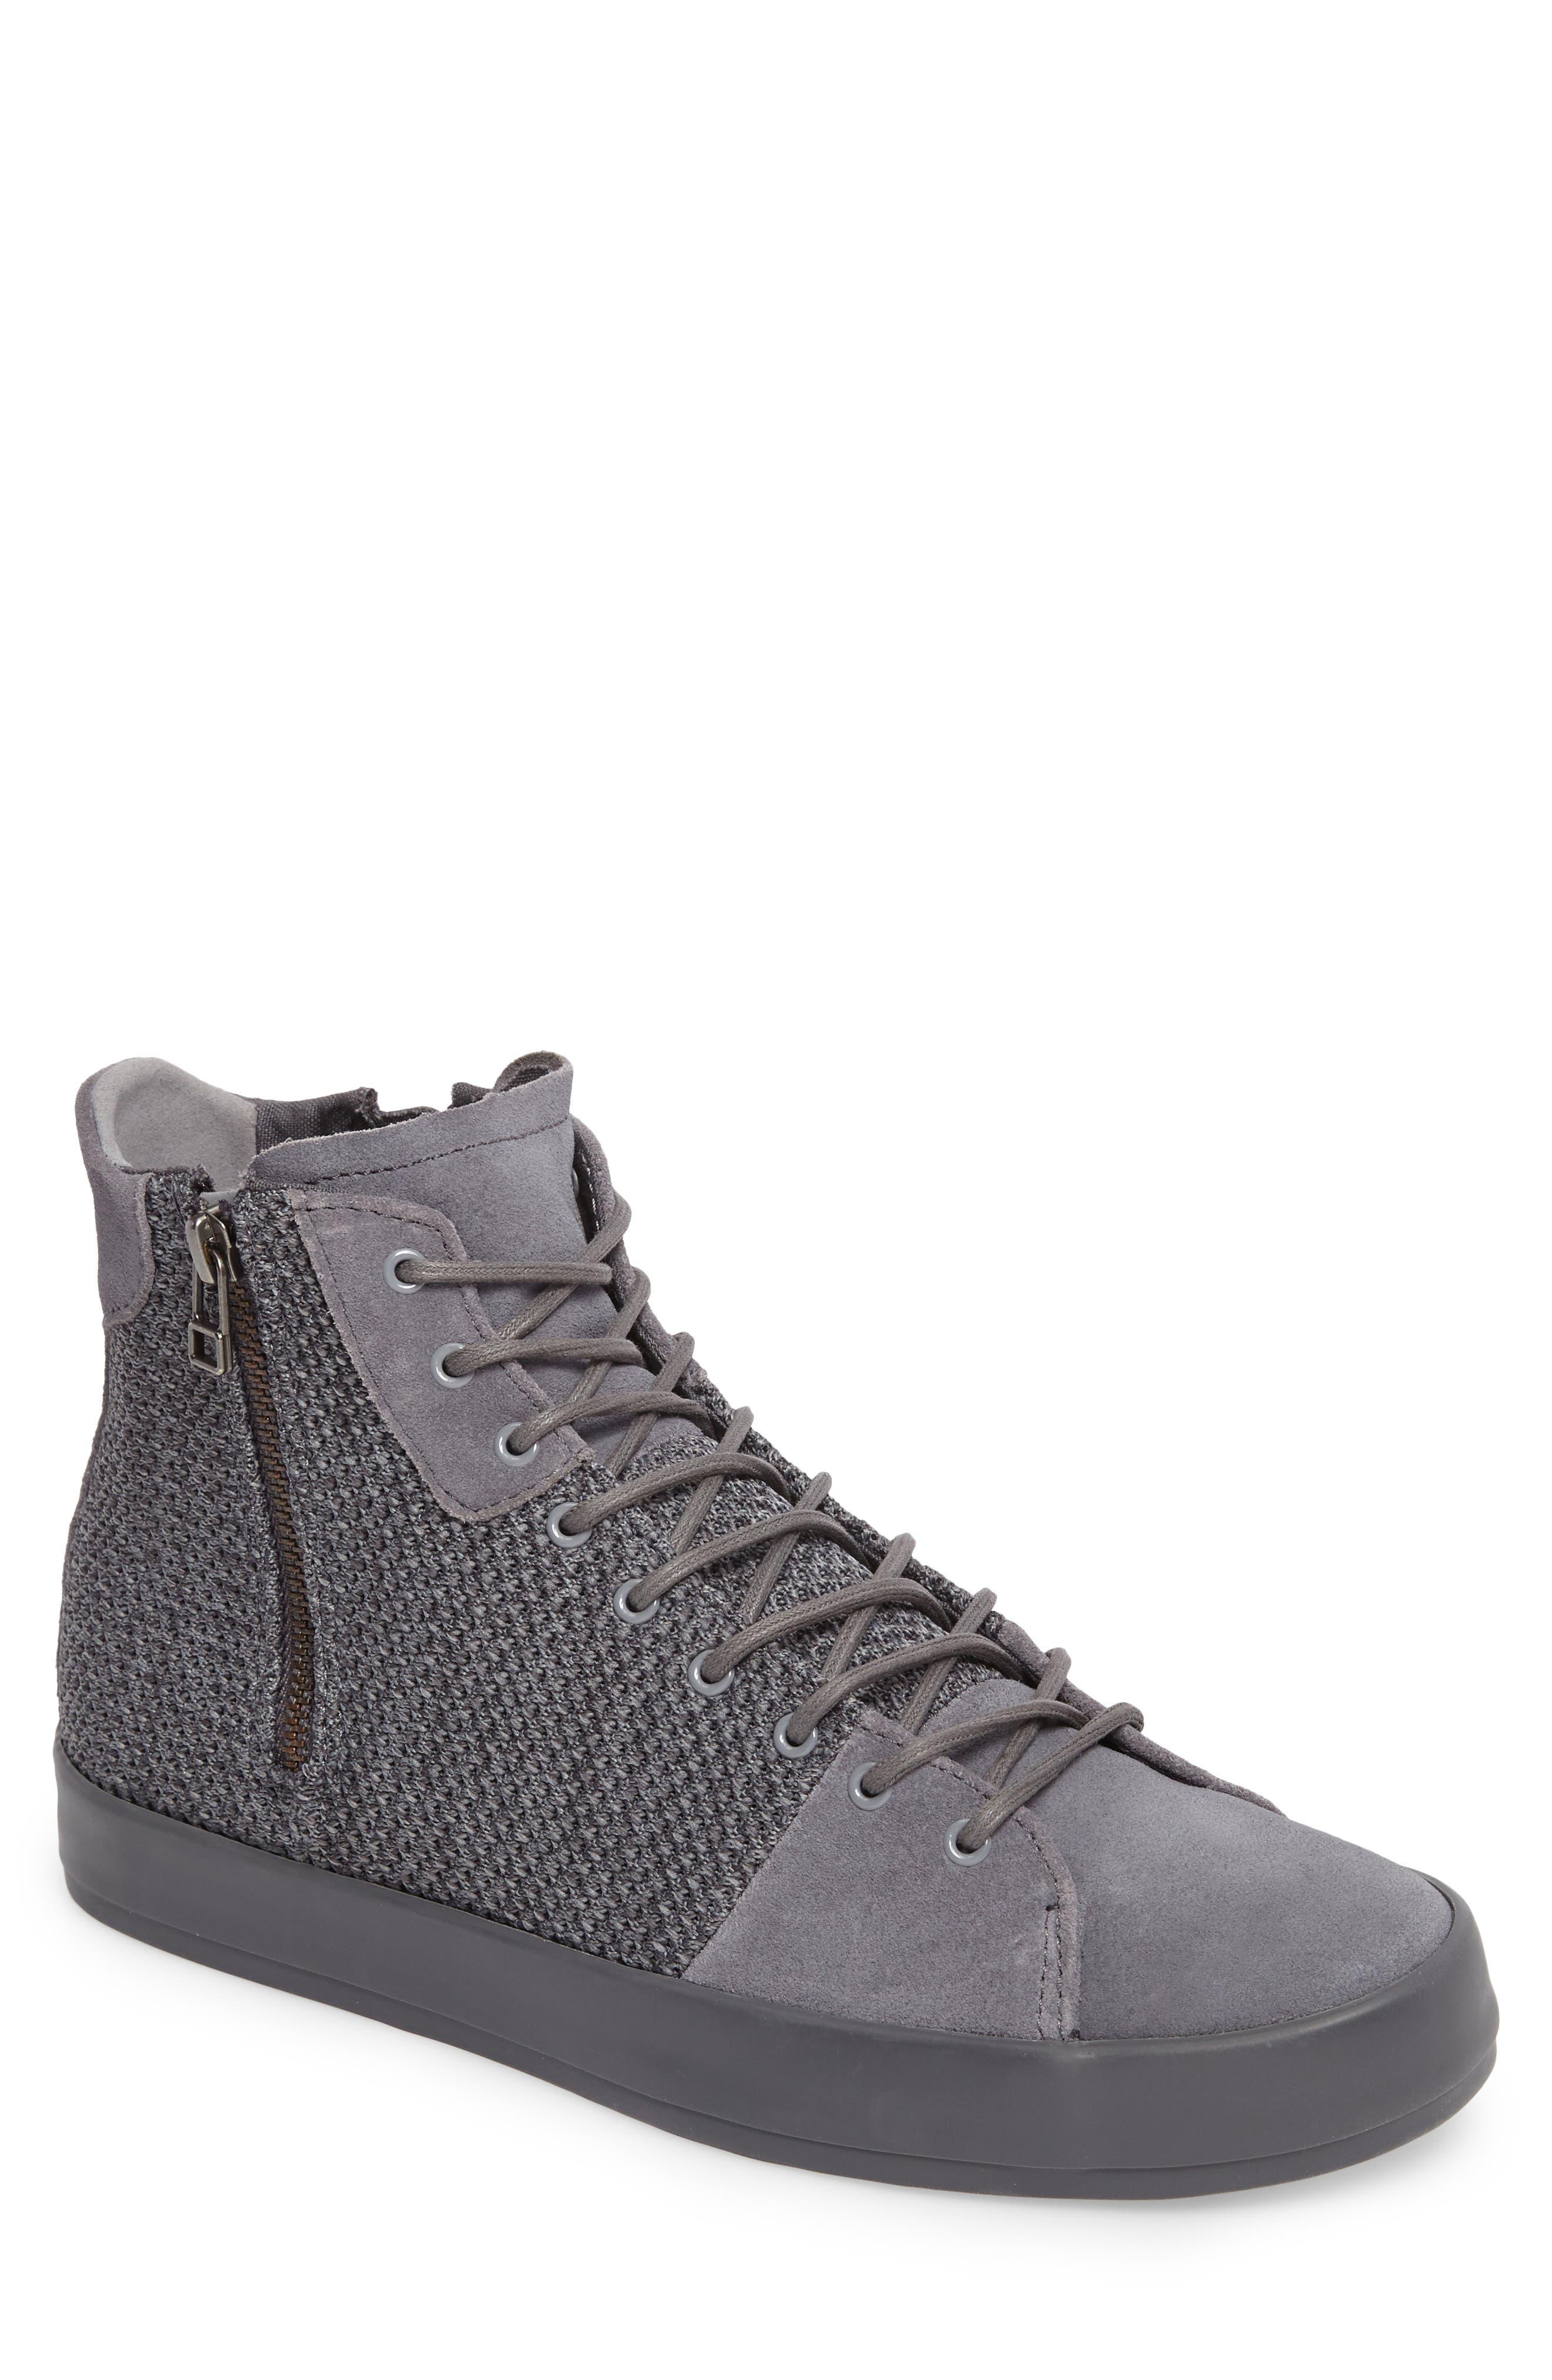 Carda Hi Sneaker,                         Main,                         color, SMOKE LEATHER